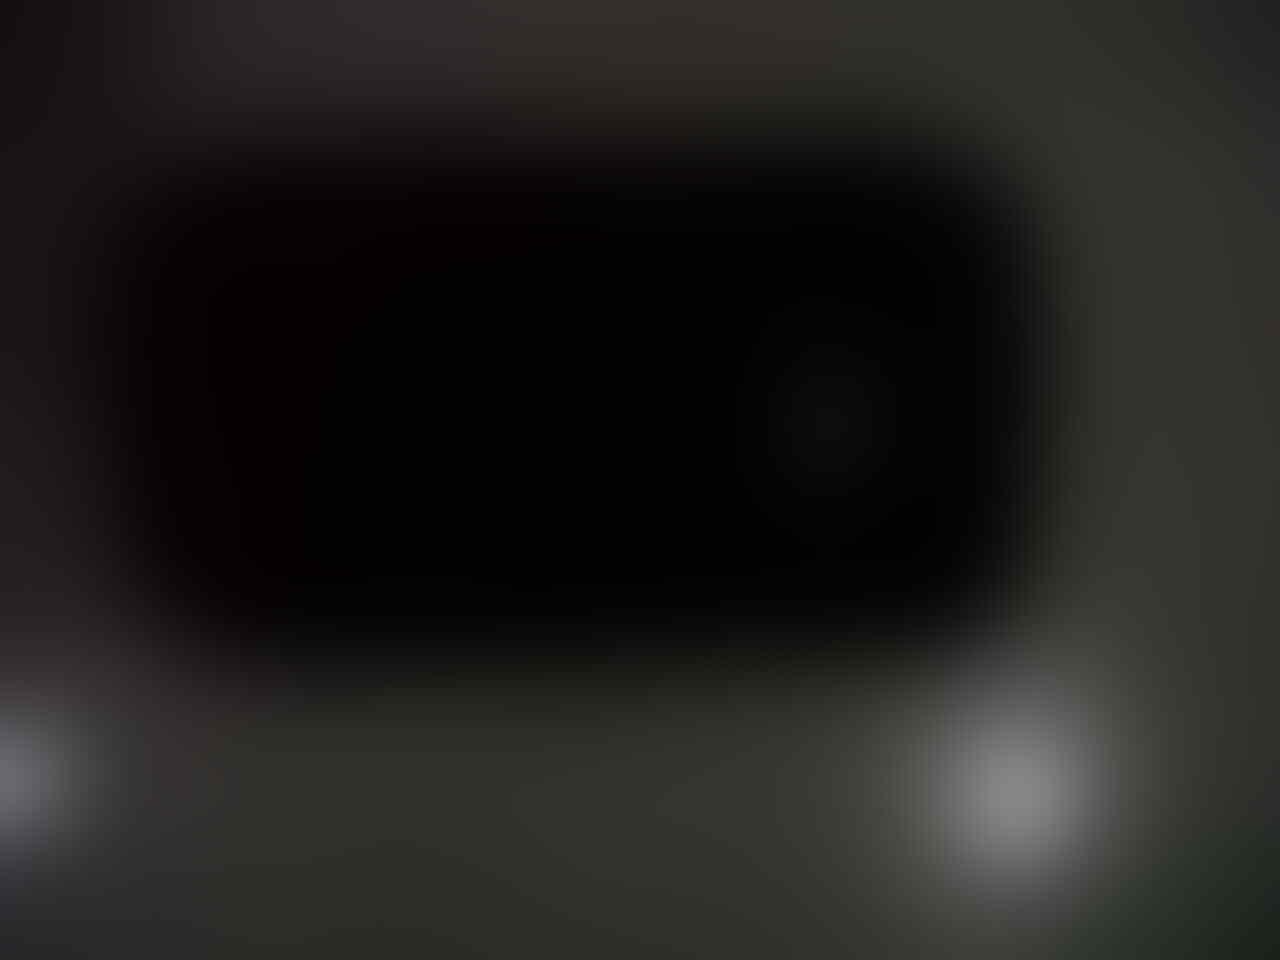 Jual: BB Gemini 3G second